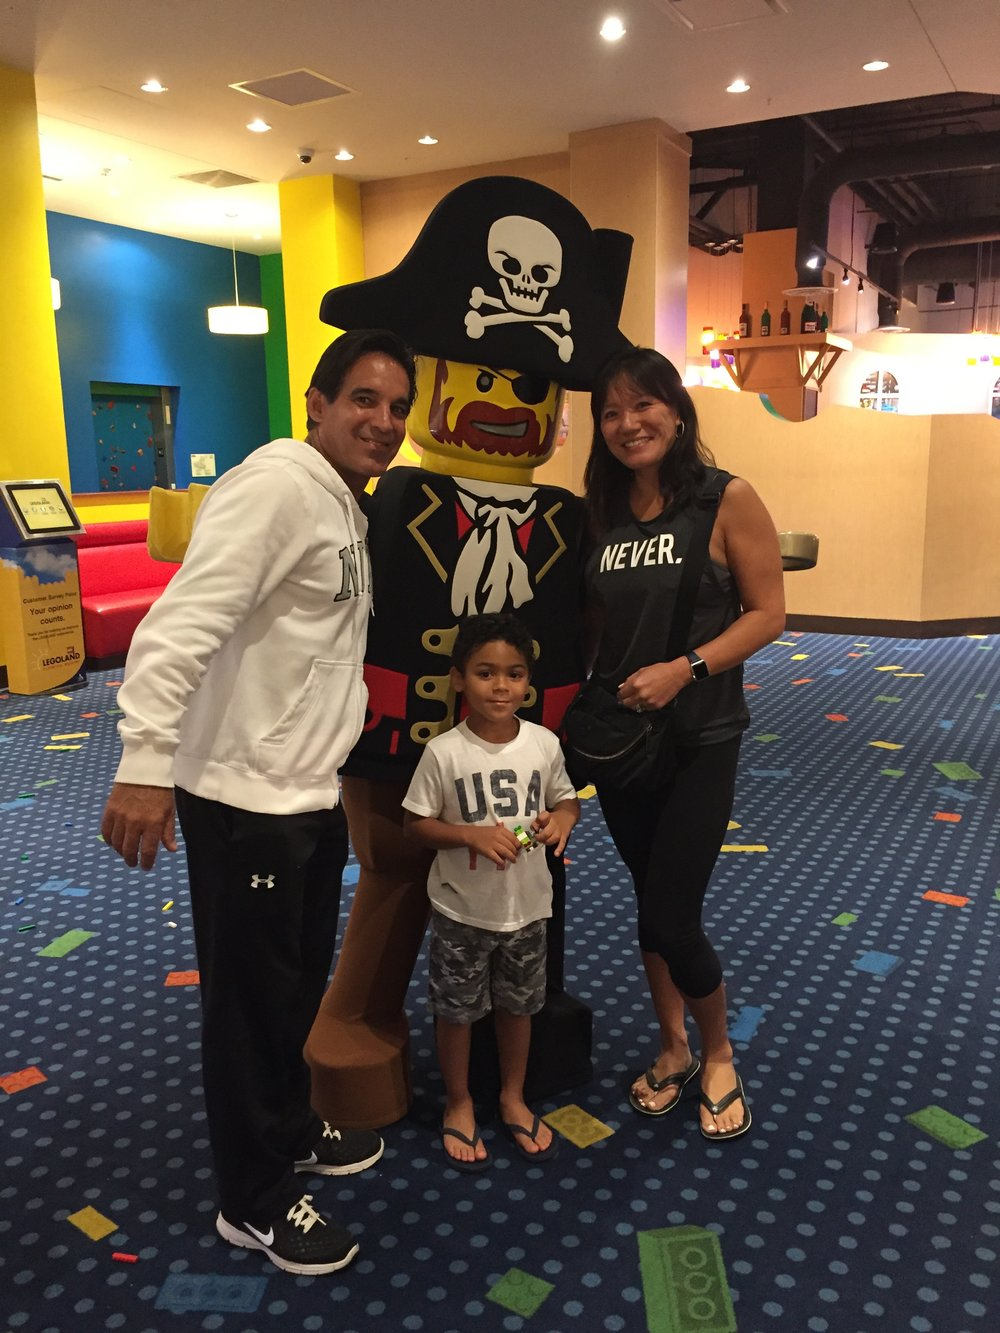 Legoland fun